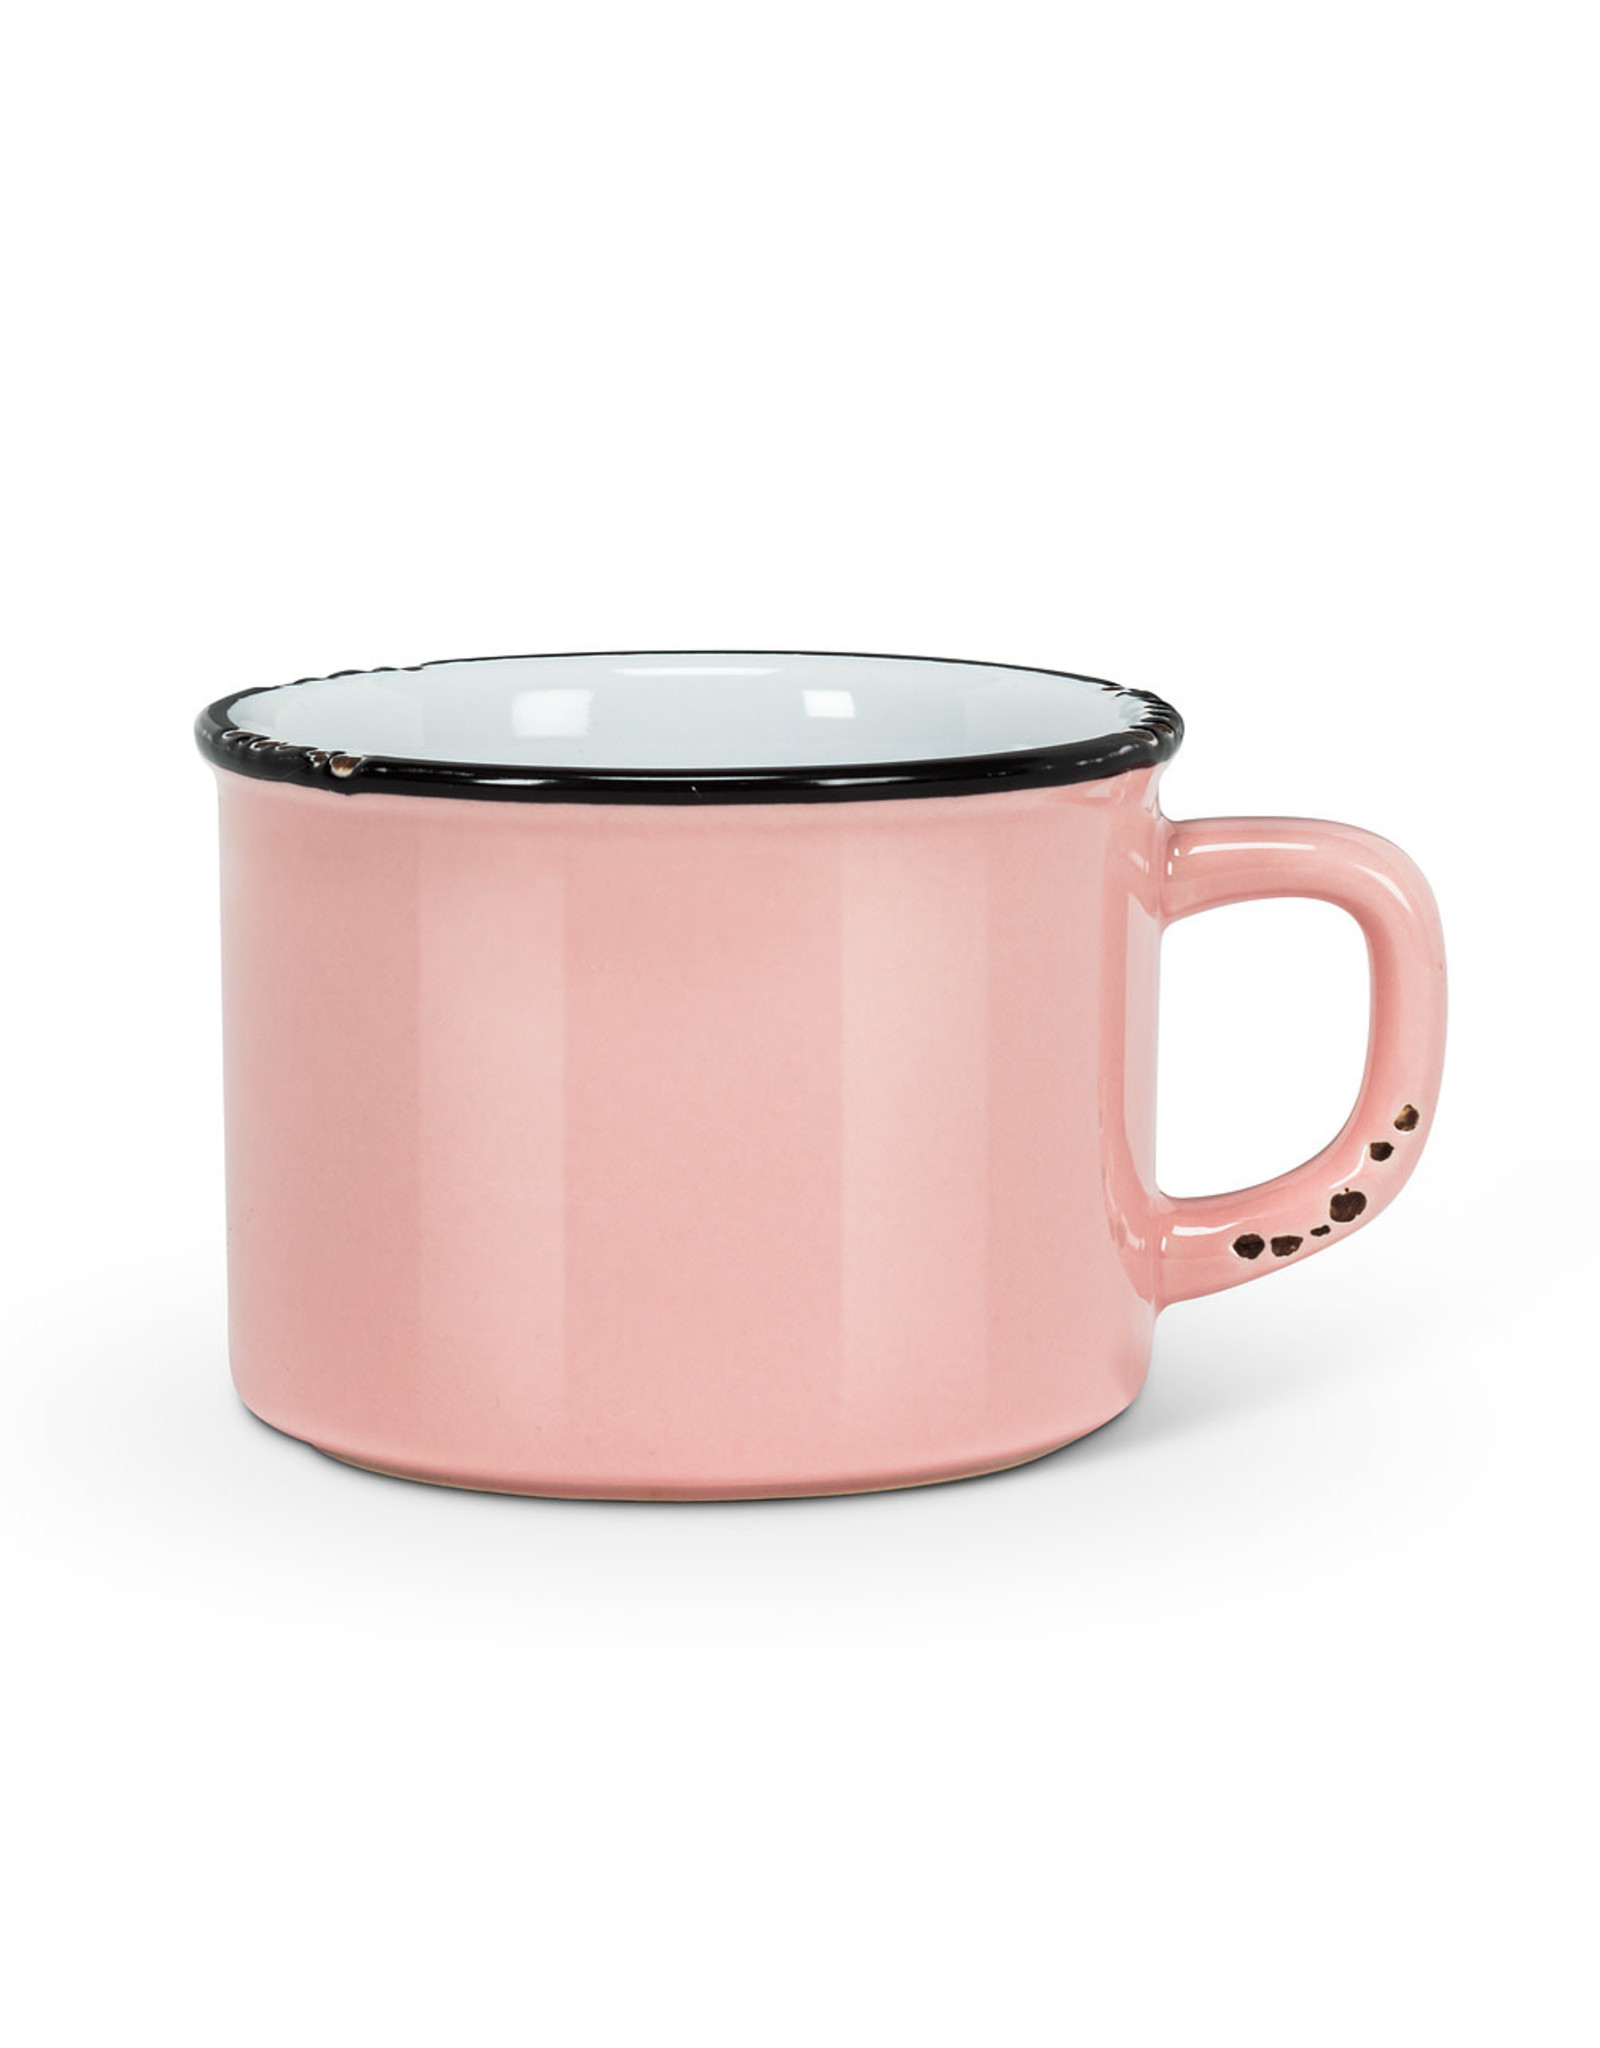 Tasse cappuccino rose en grès (8 oz)